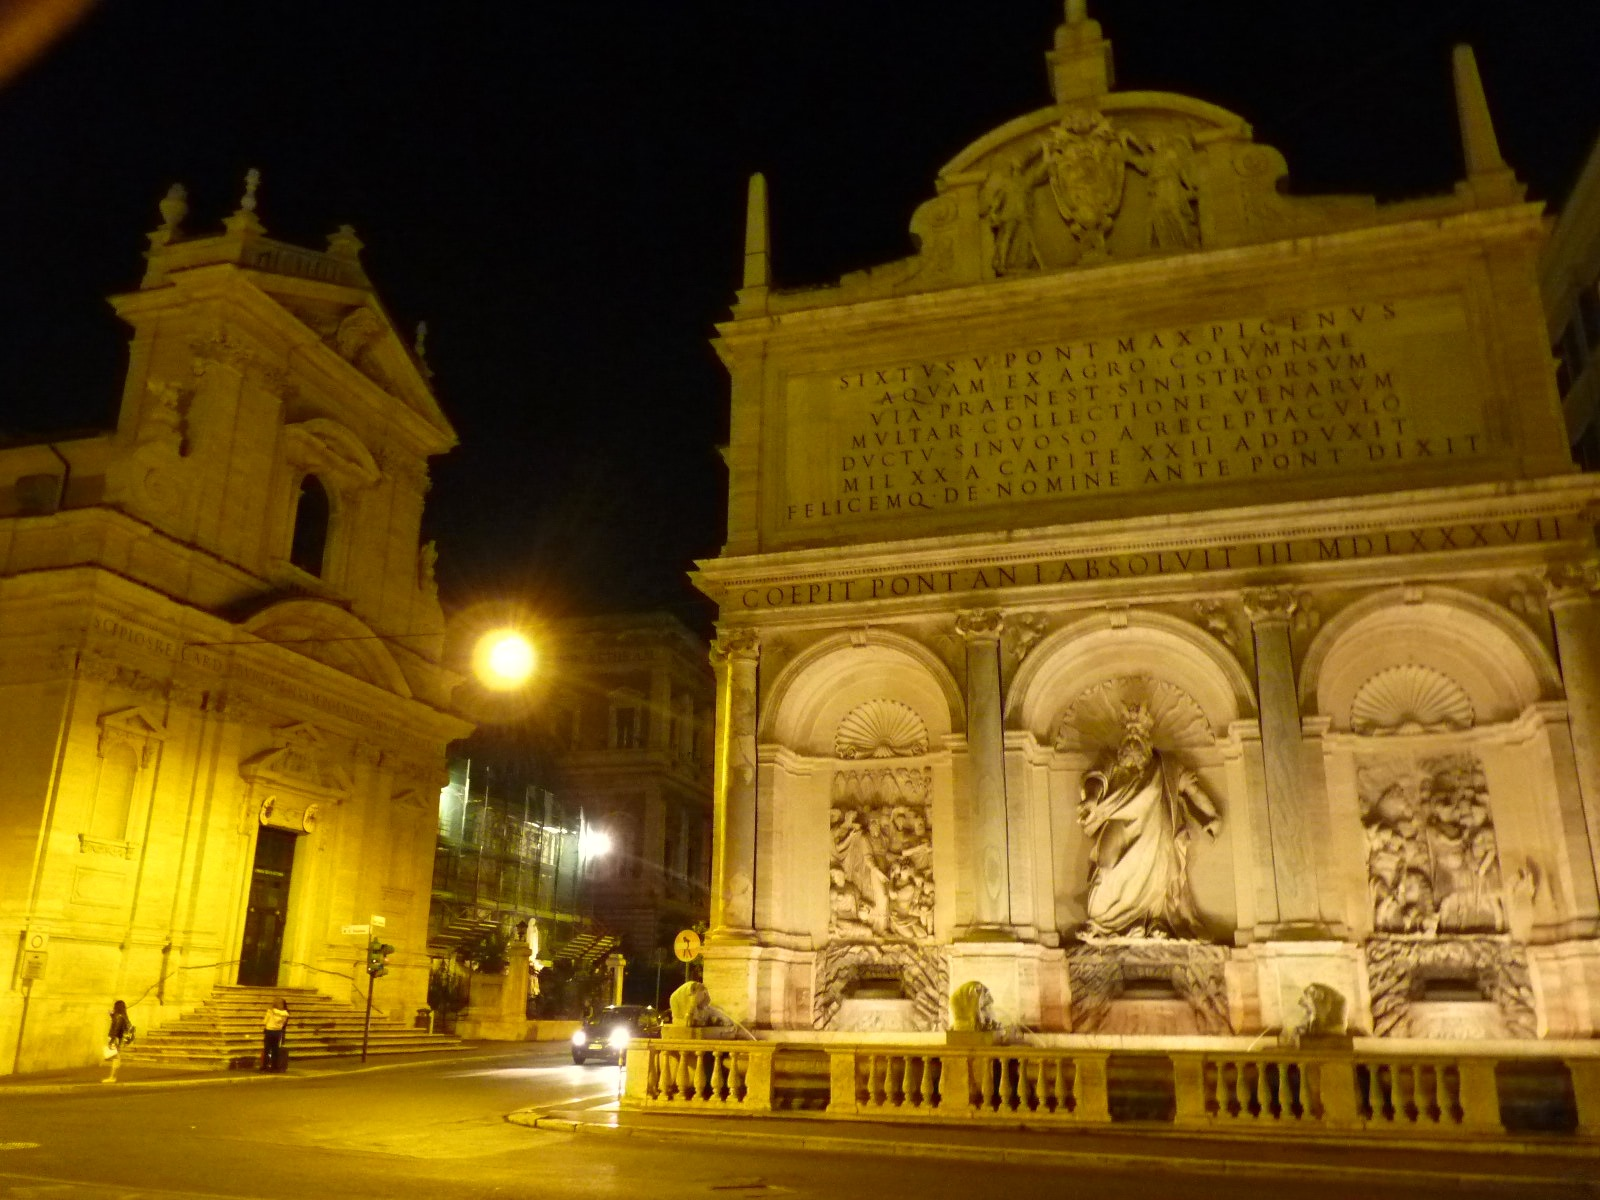 Just-another-street-corner-Rome.jpg